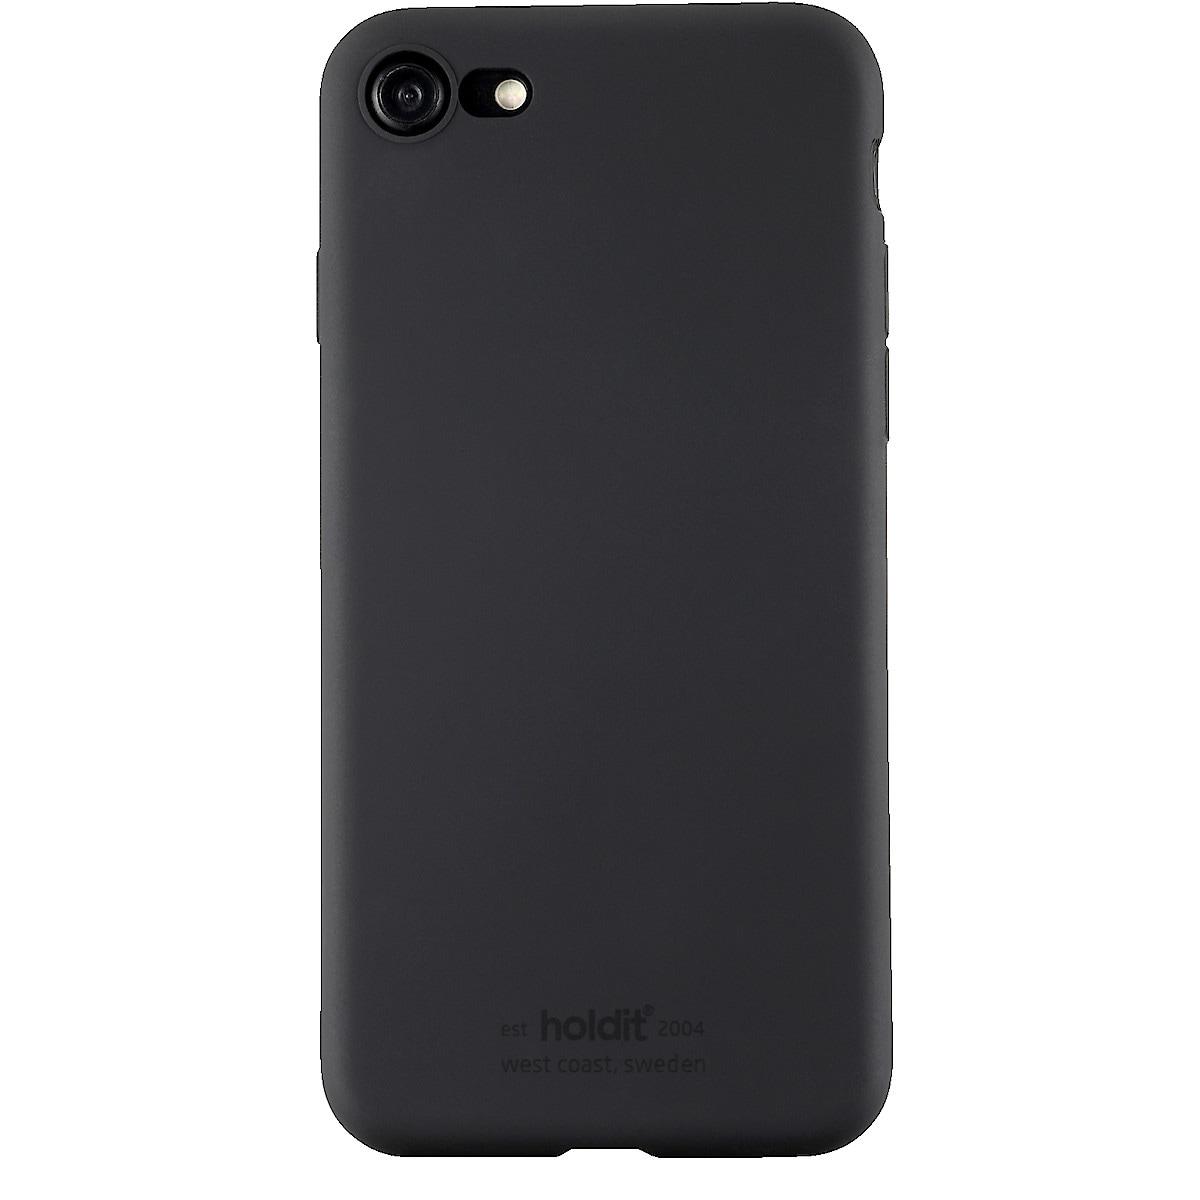 Kuori silikonia iPhone 8 ja iPhone SE 2020, Holdit